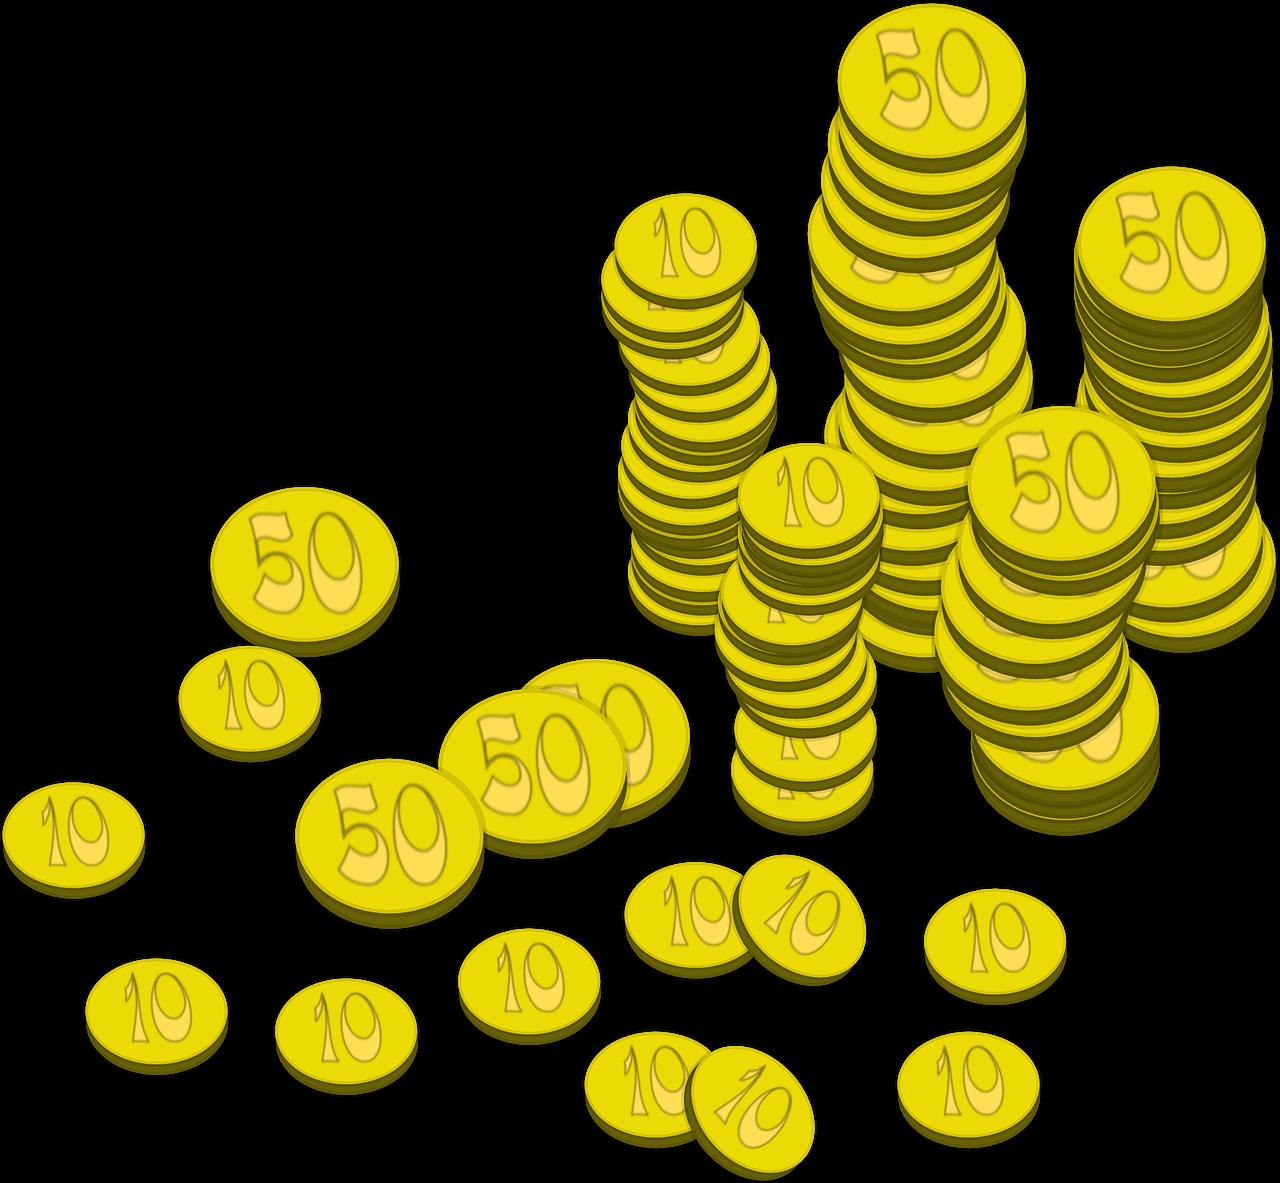 Монеты картинки анимации